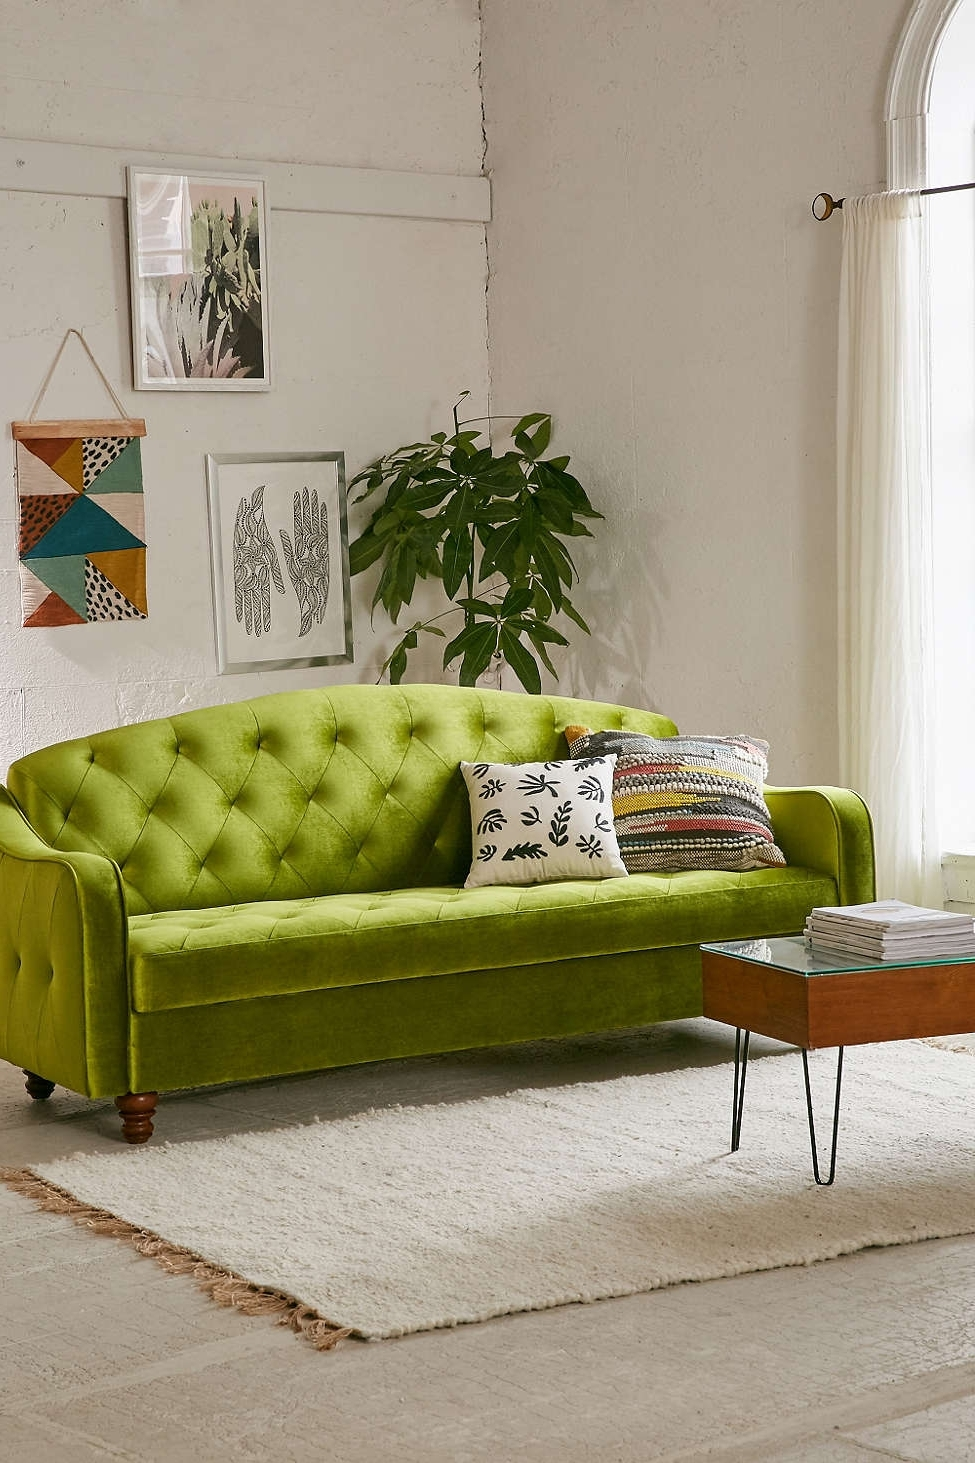 Well Liked Peterborough Ontario Sectional Sofas Regarding Furniture : Purple Tufted Sofa For Sale Kijiji Peterborough Sofa (View 15 of 20)